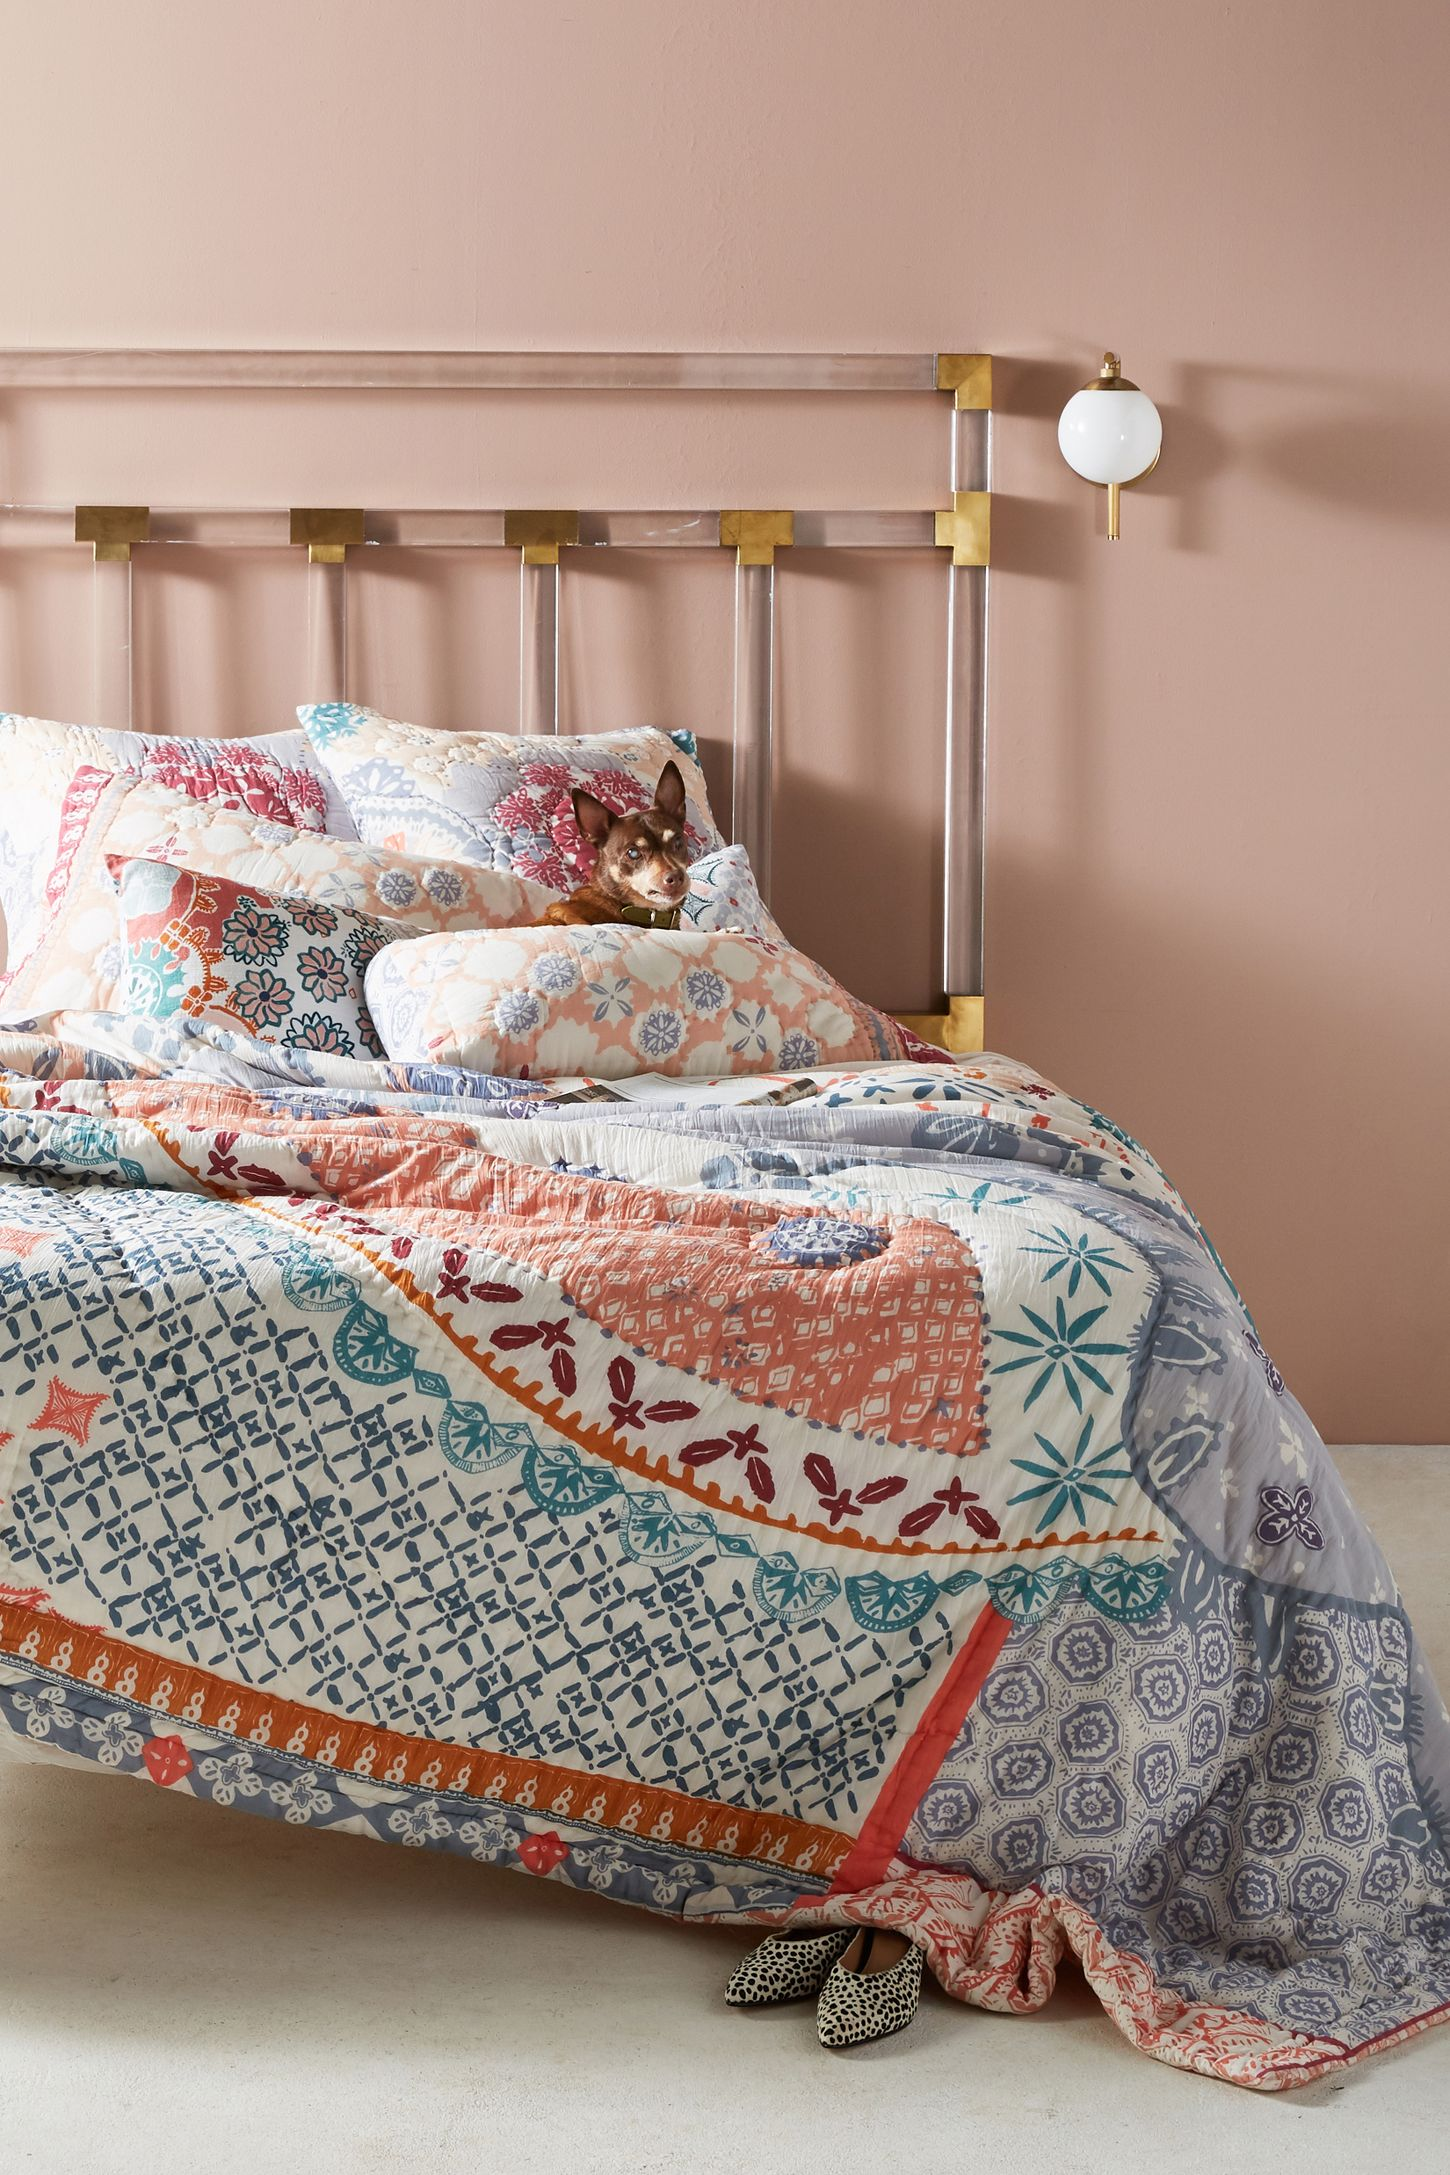 Shop Unique Quilts & Bedding Coverlets | Anthropologie : quilts - Adamdwight.com